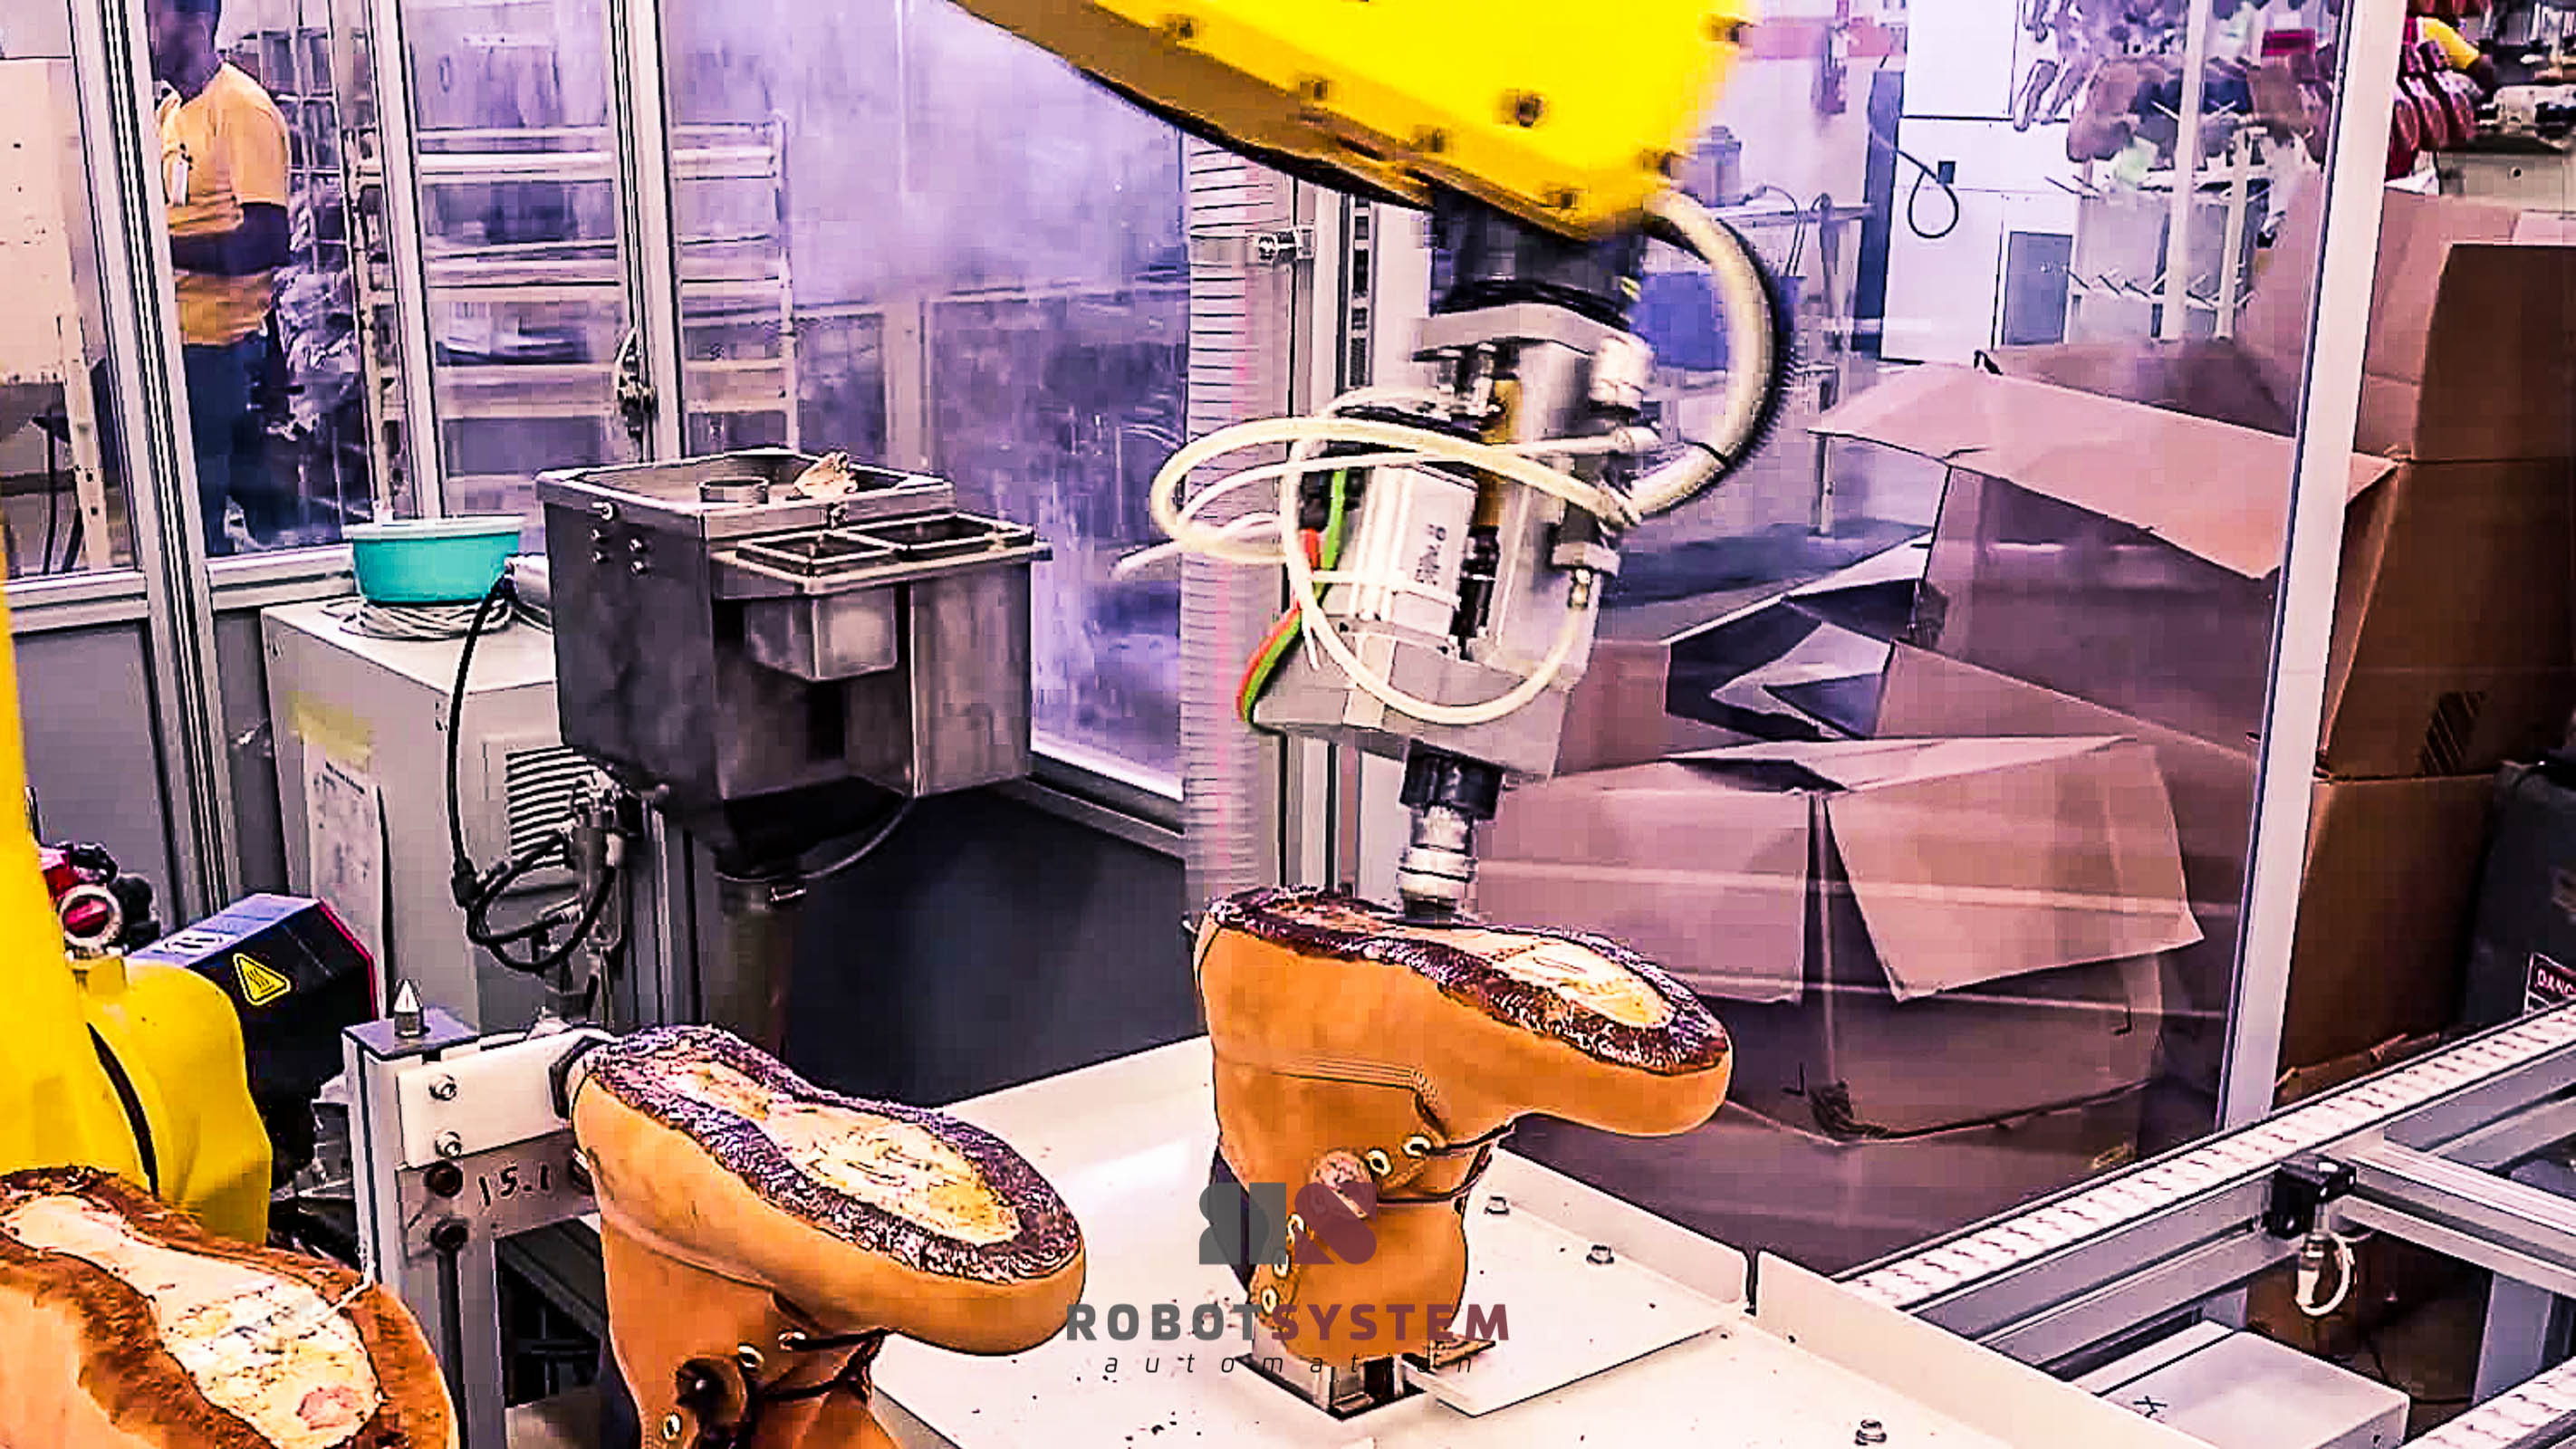 Robot System Automation